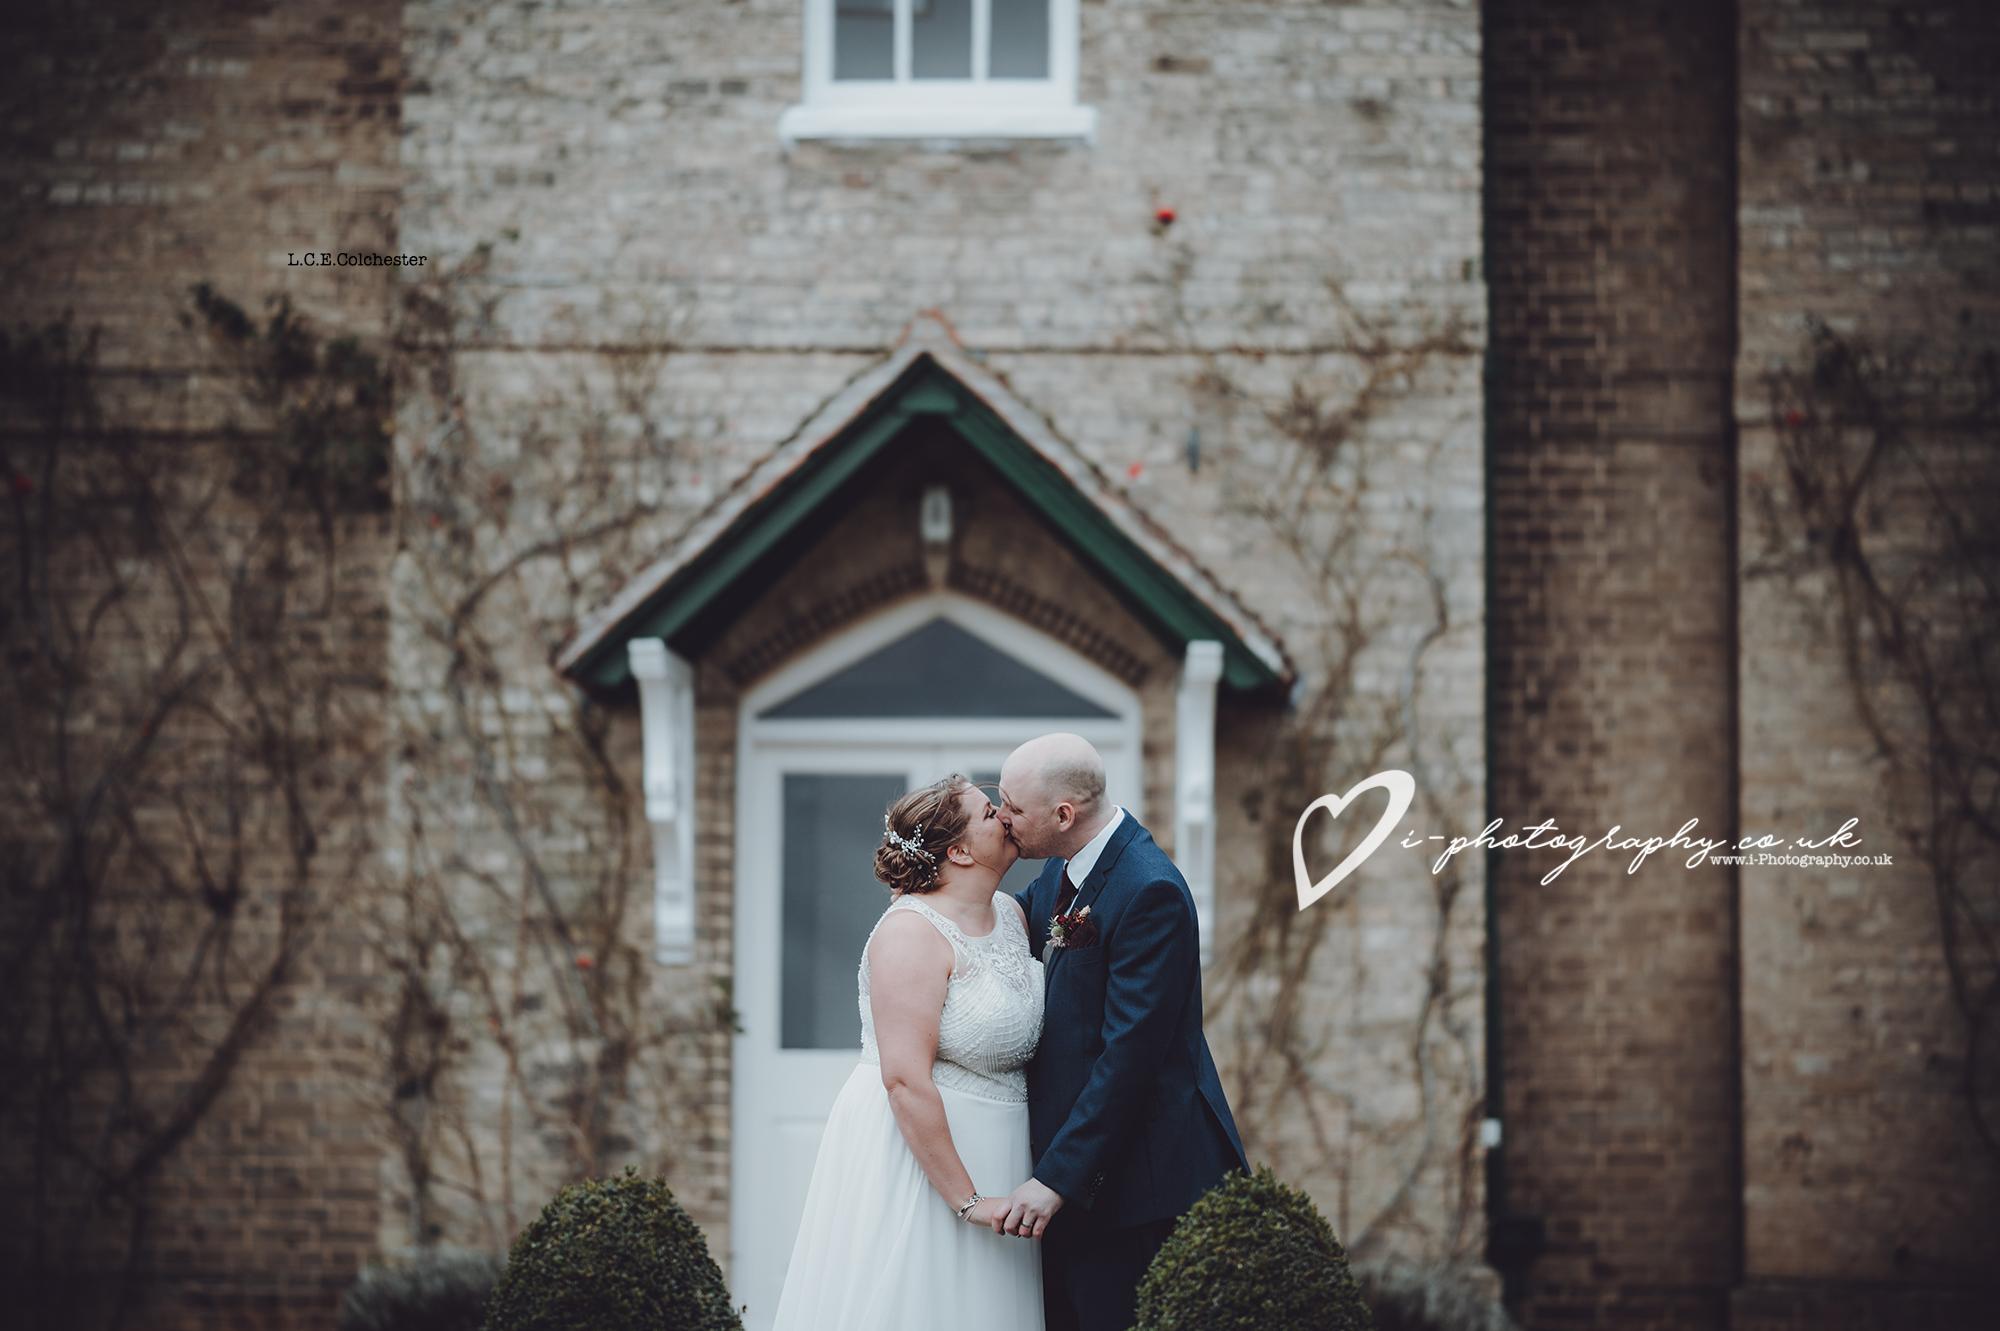 Tim & Emma's Wedding photos